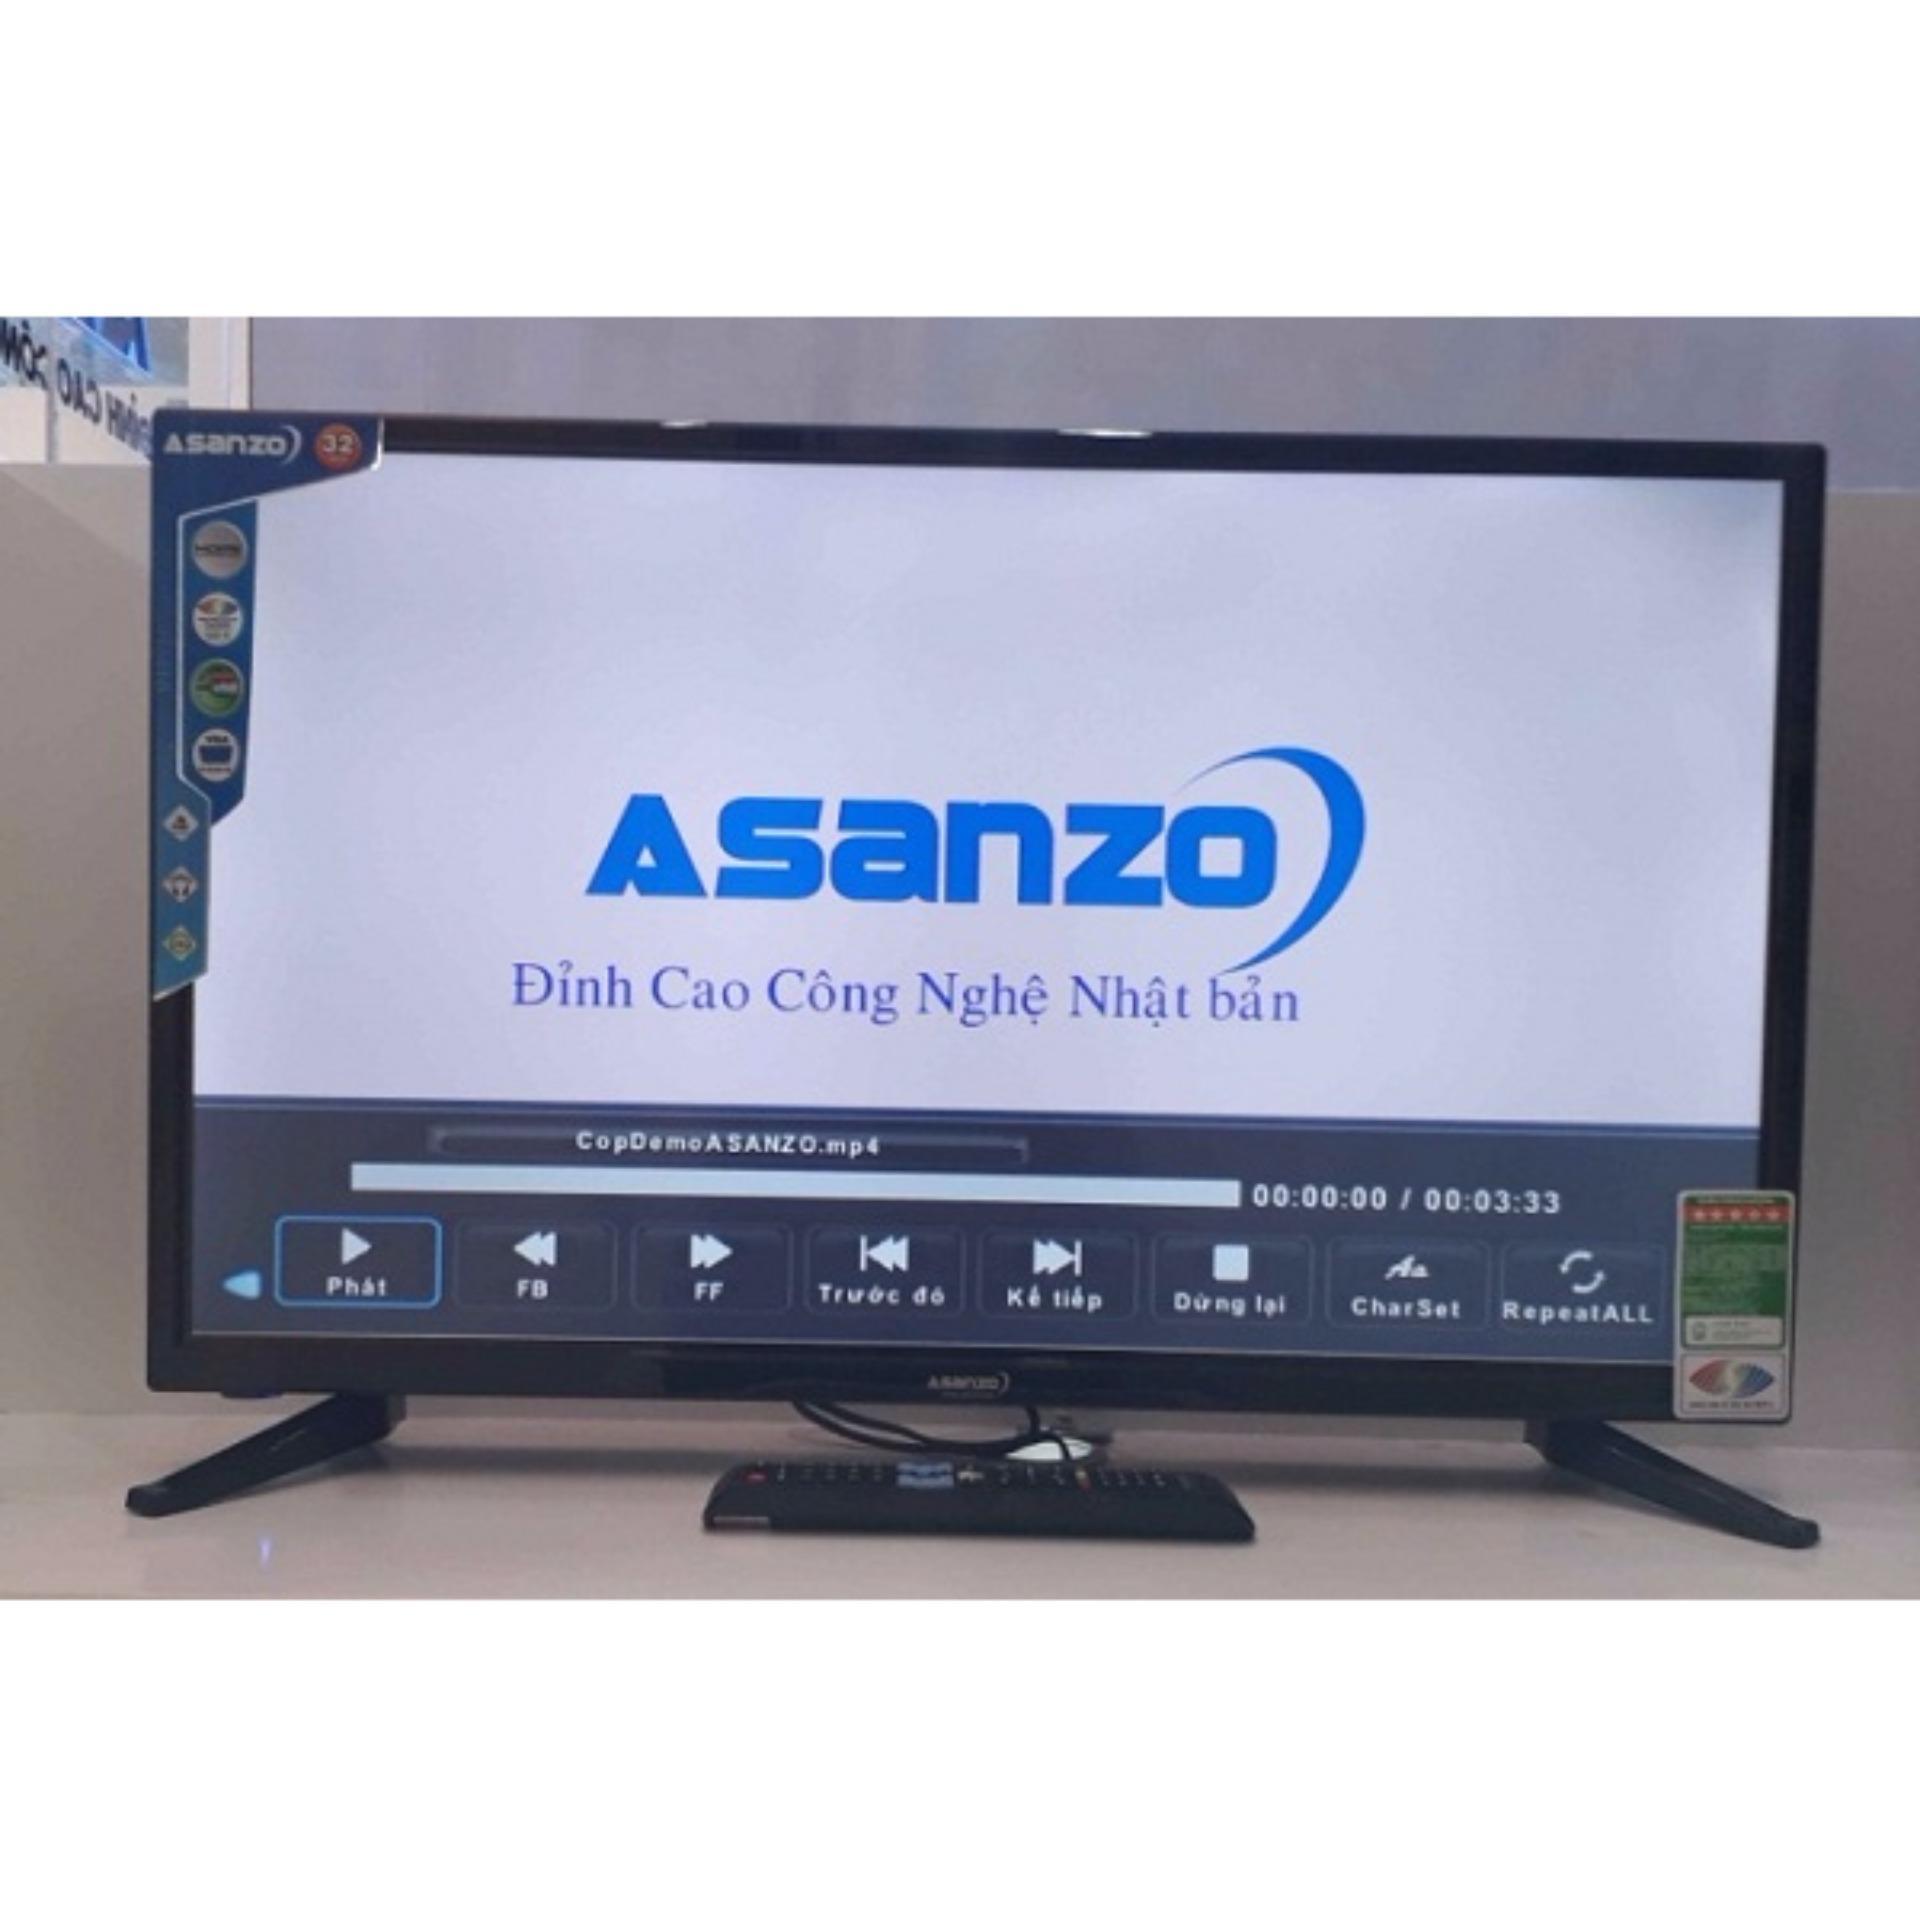 Tivi LED Asanzo 32 inch HD - Model ES32T800 (Đen)